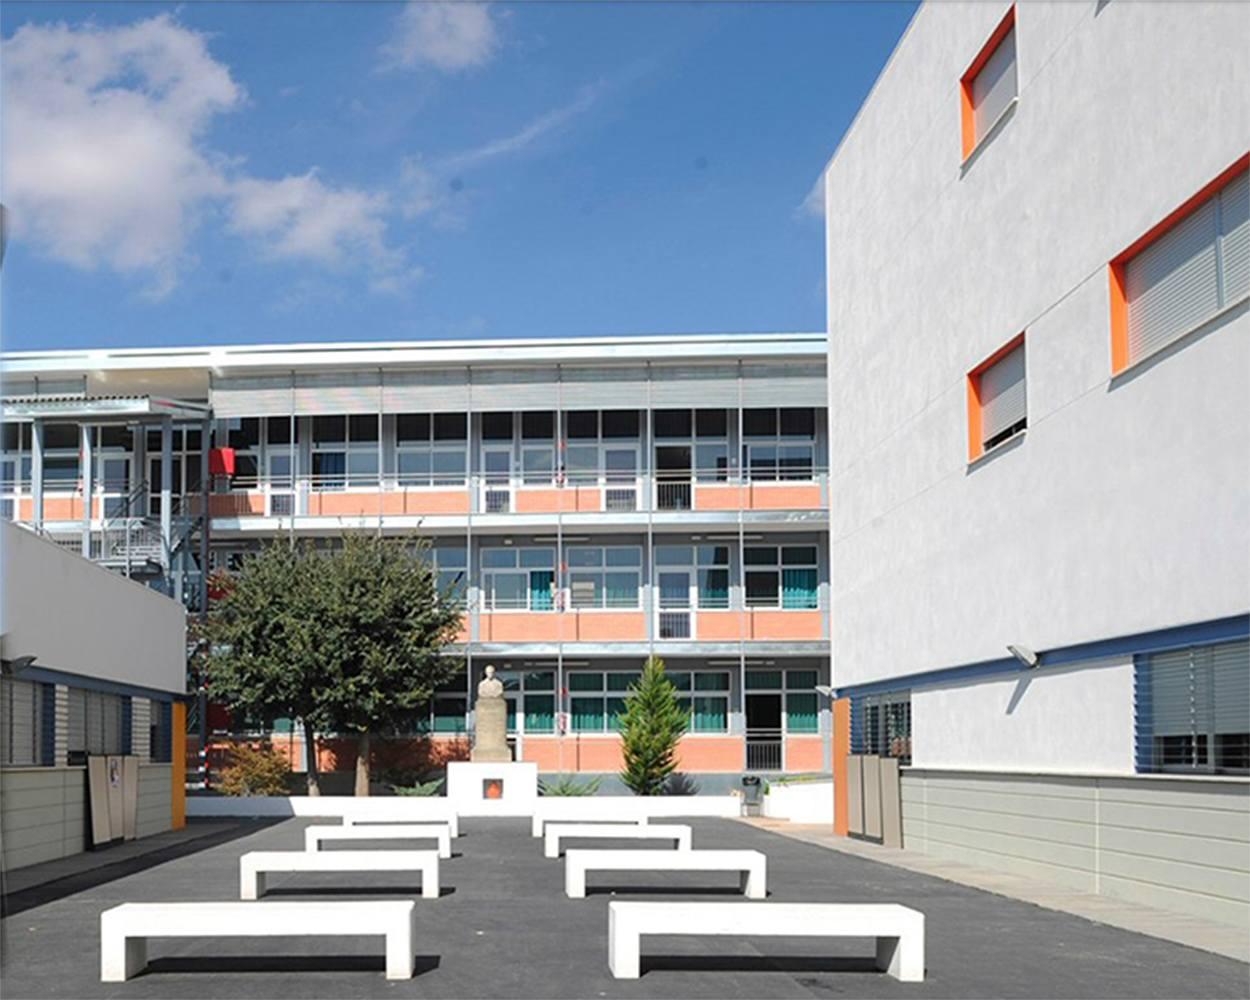 Colegio arquitectos ciudad real good latest beautiful - Arquitectos ciudad real ...